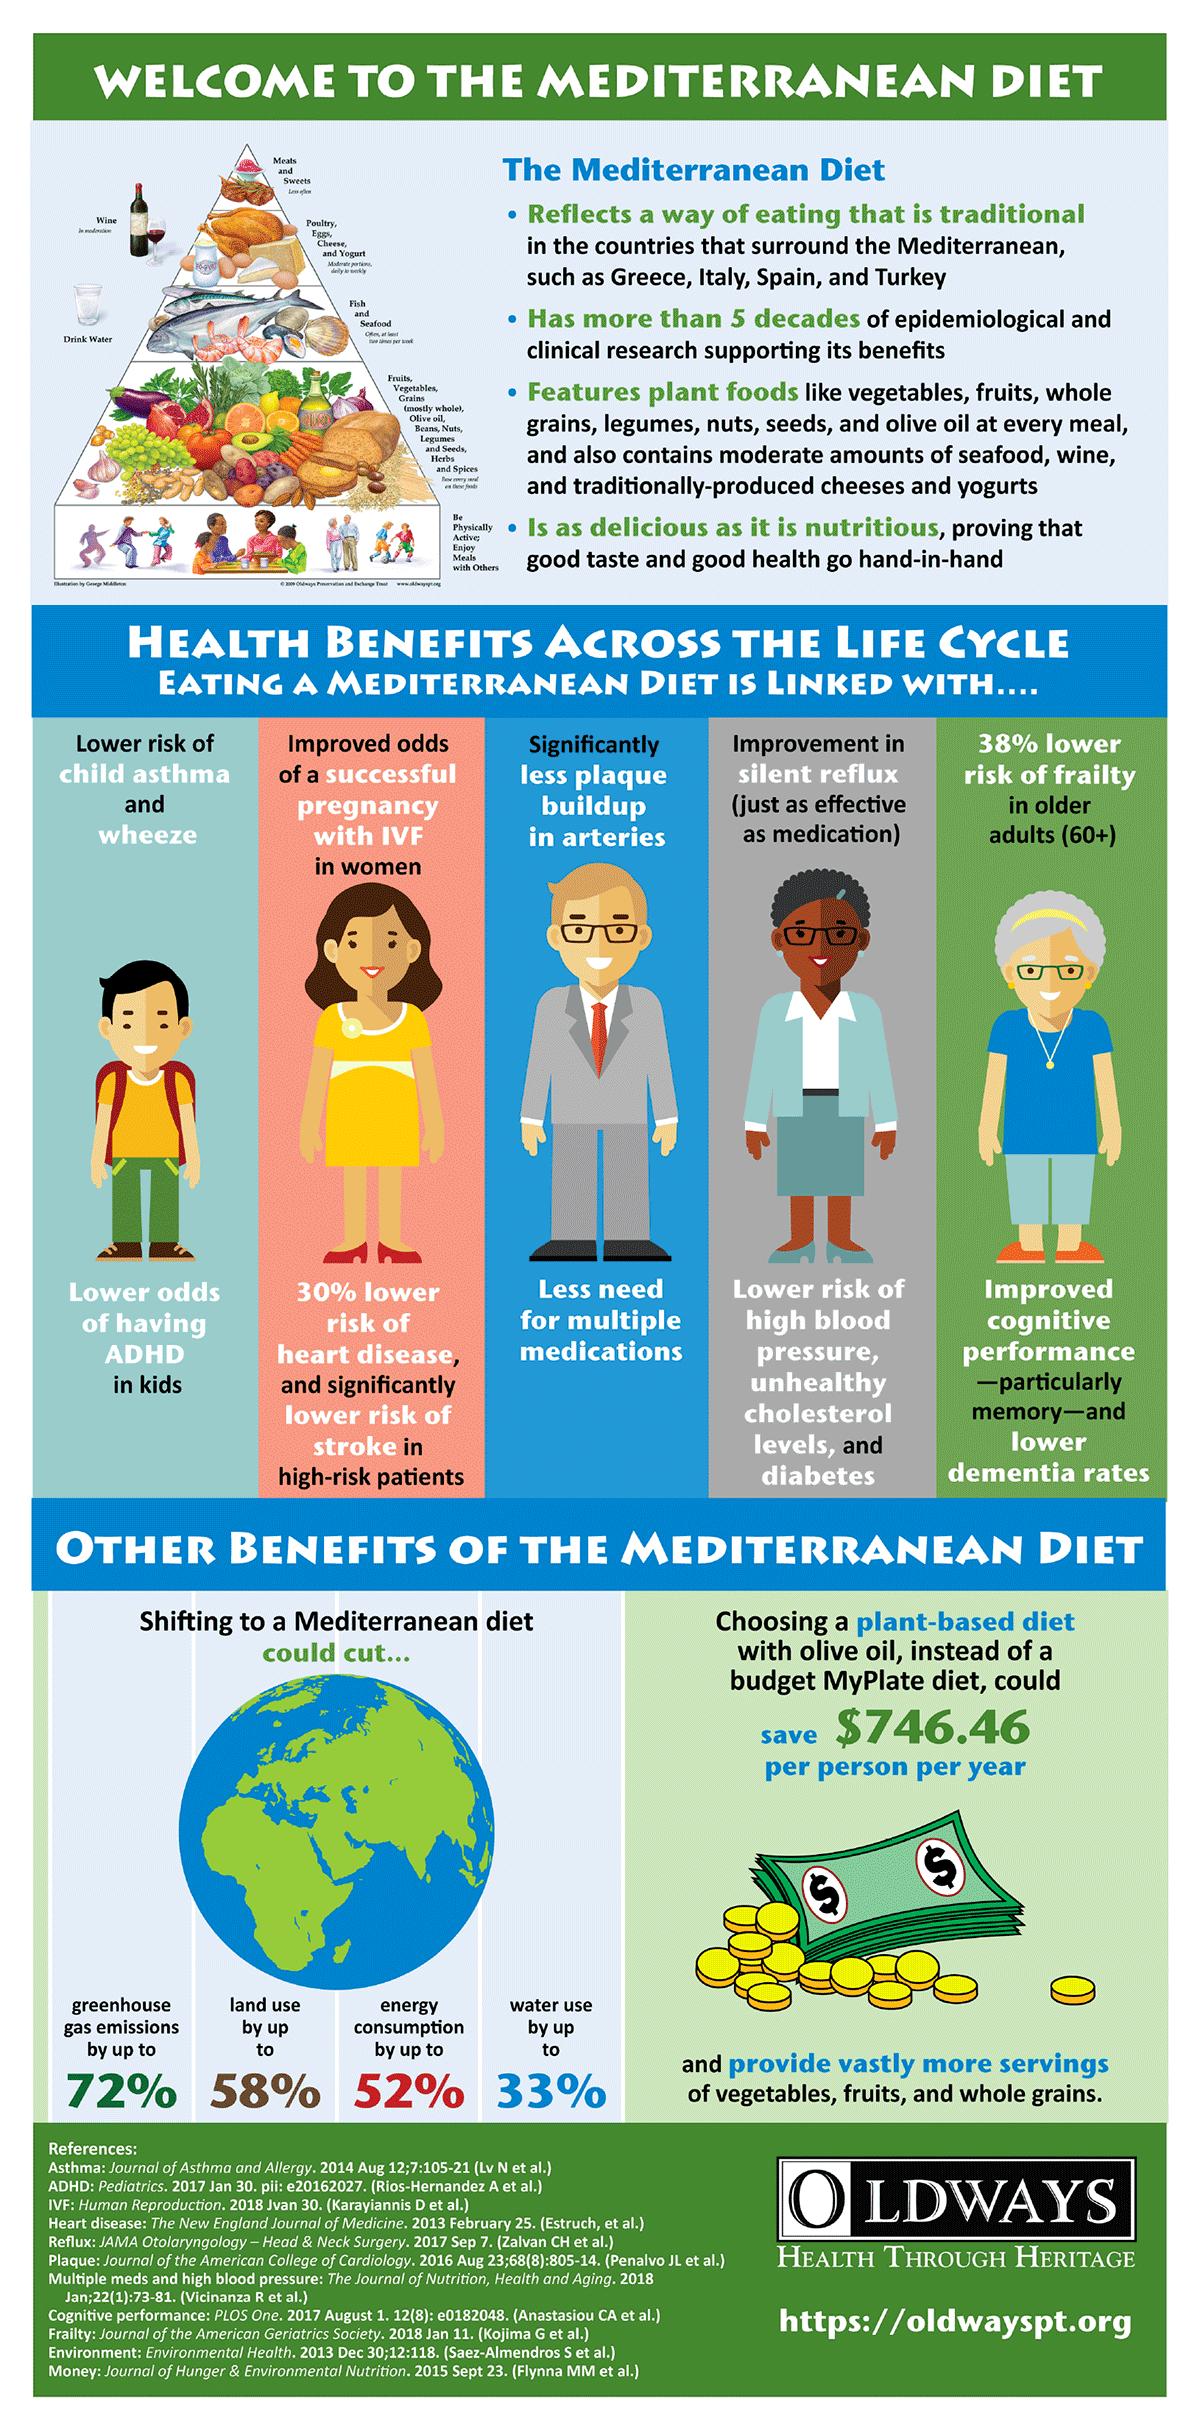 Mediterranean Diet Helps To Protect Against Type 2 Diabetes